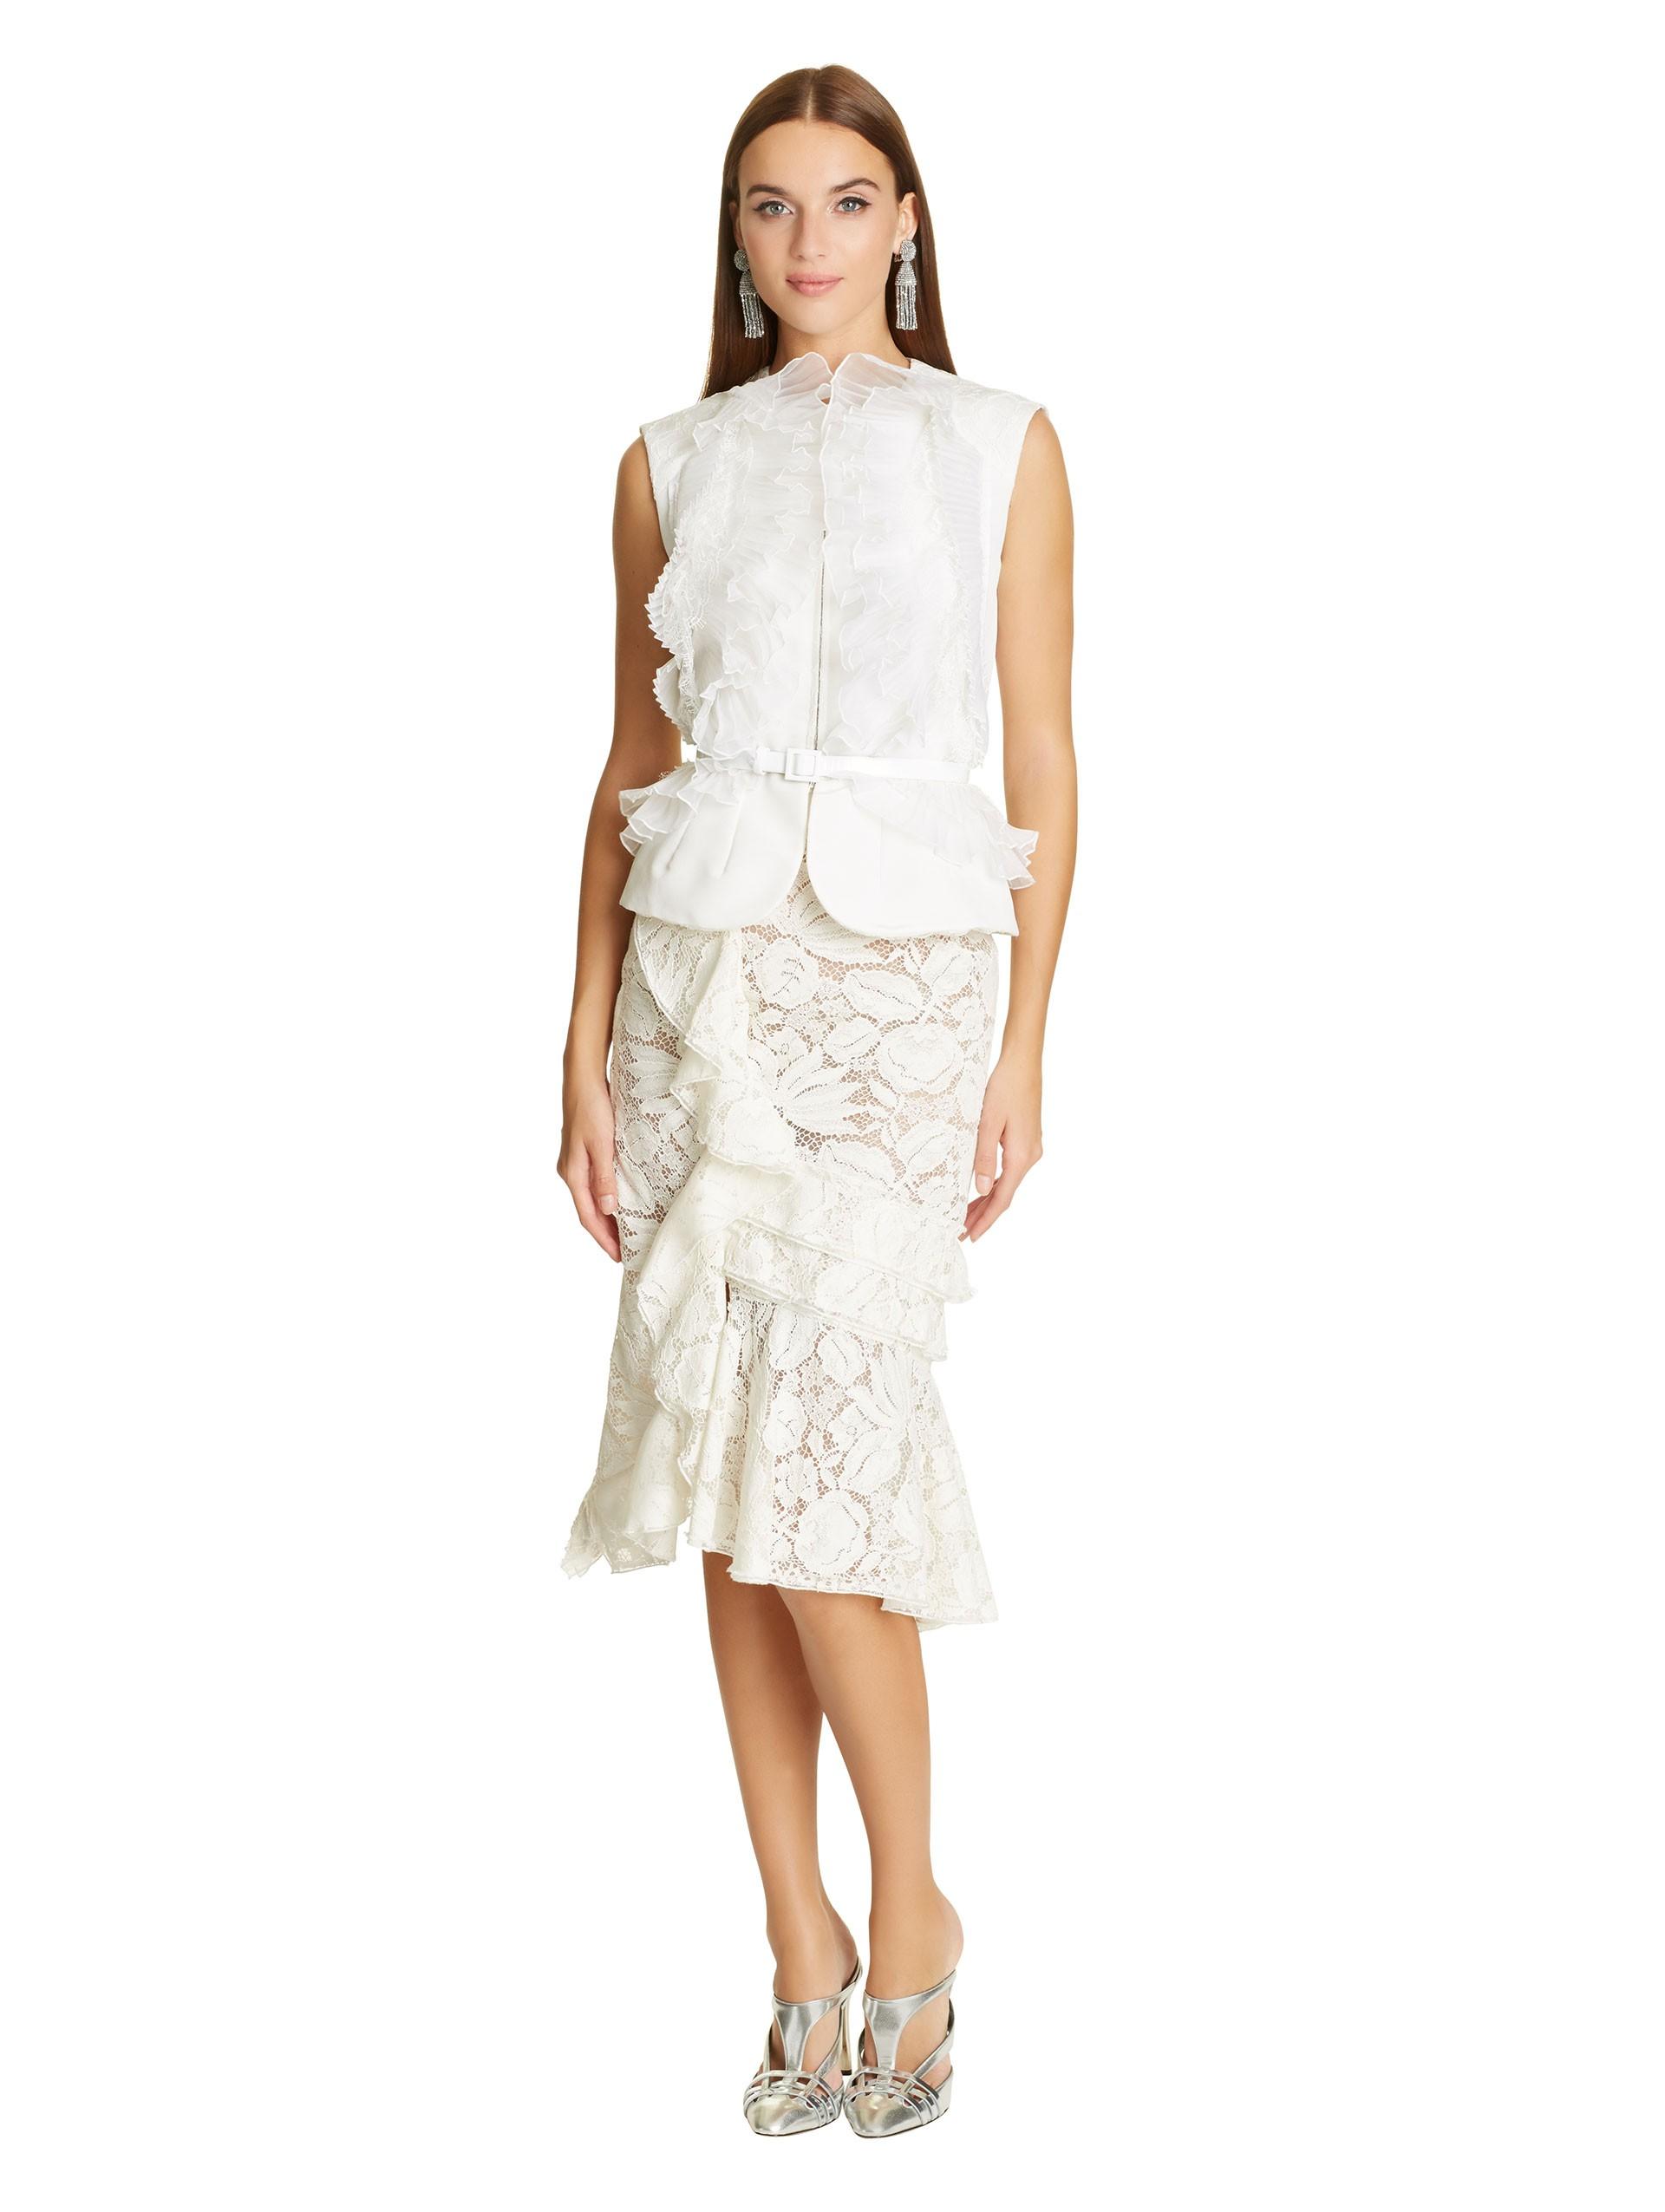 12666a6f4 Oscar de la Renta Ivory Organza & Lace Ruffle Detail Silk Faille ...